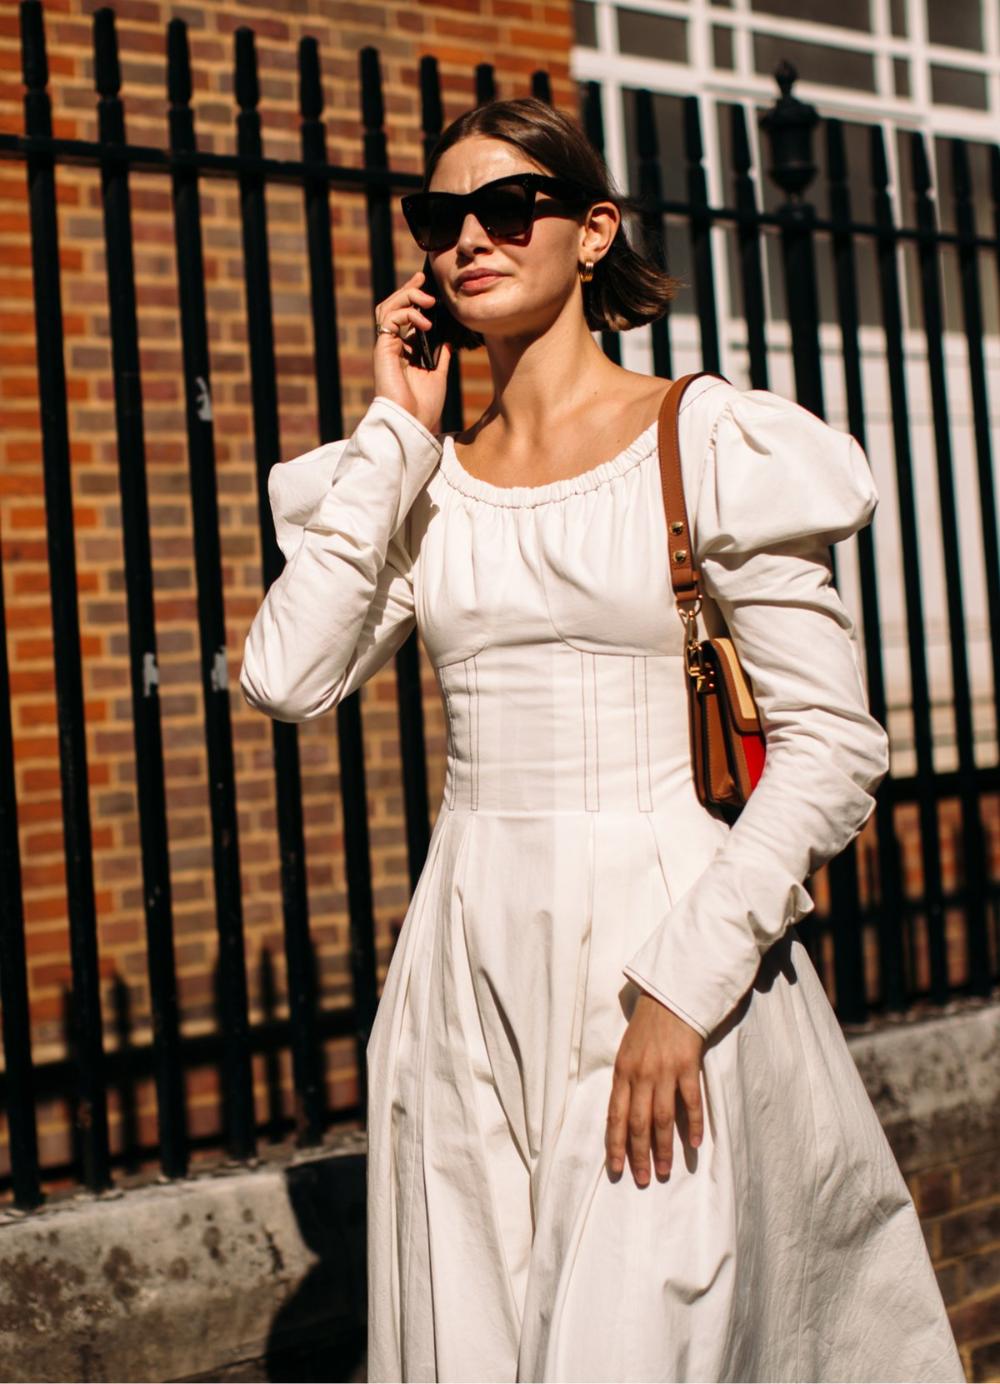 32 Best Summer Dresses For 2021 Flowy Summer Day Dresses Best Summer Dresses Summer Day Dresses Summer Dresses [ 1384 x 1000 Pixel ]